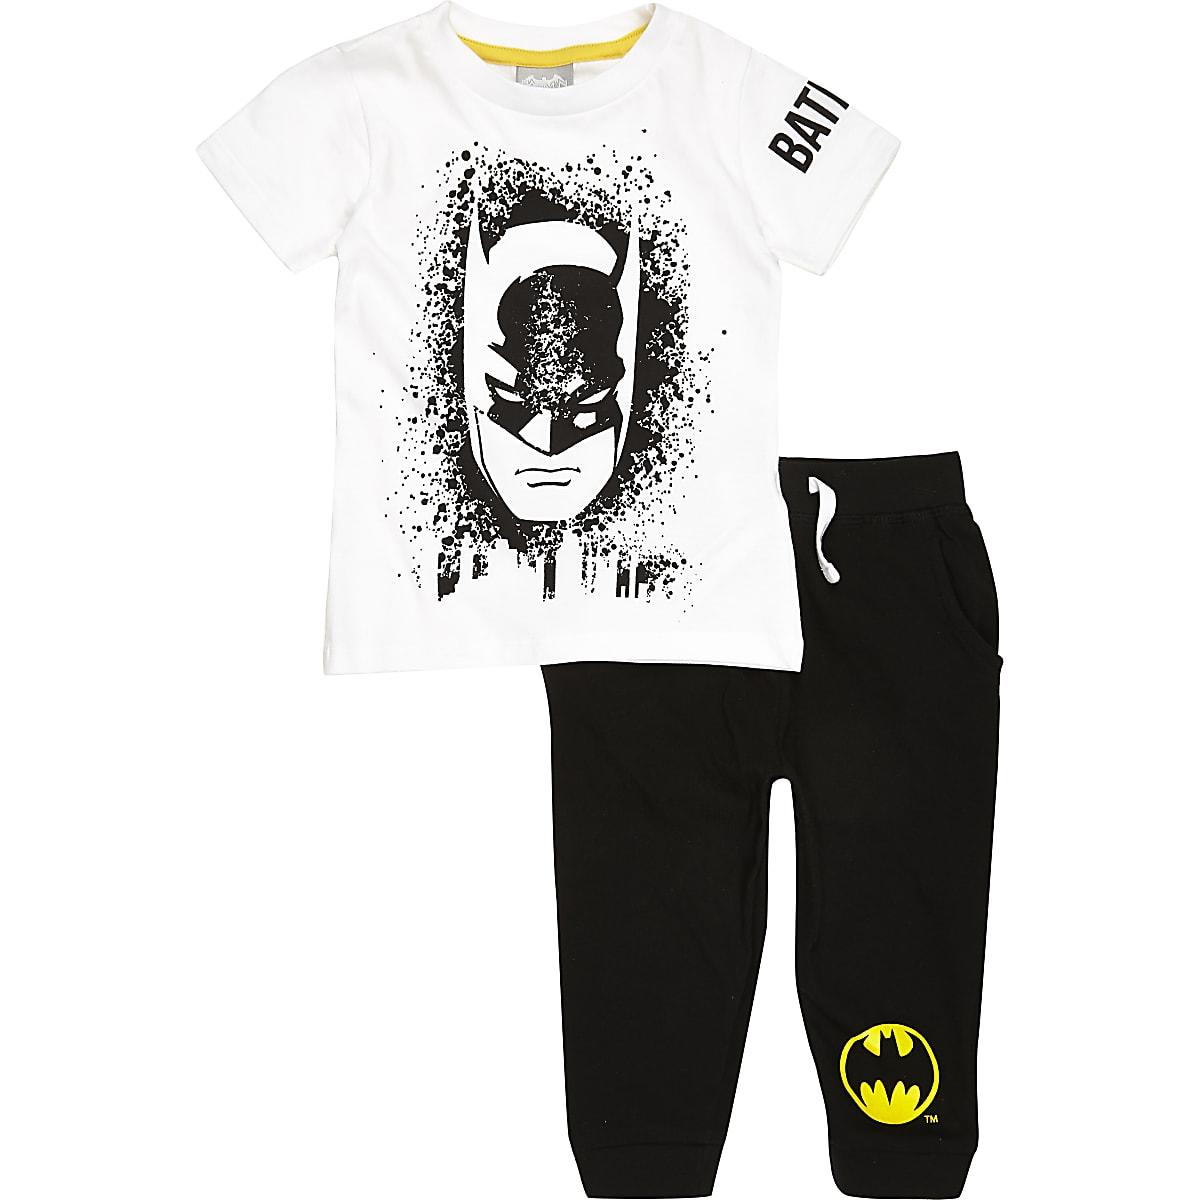 57d3745ae9abc Mini boys black Batman pyjama set - Baby Boys Pyjamas - Mini Boys - boys